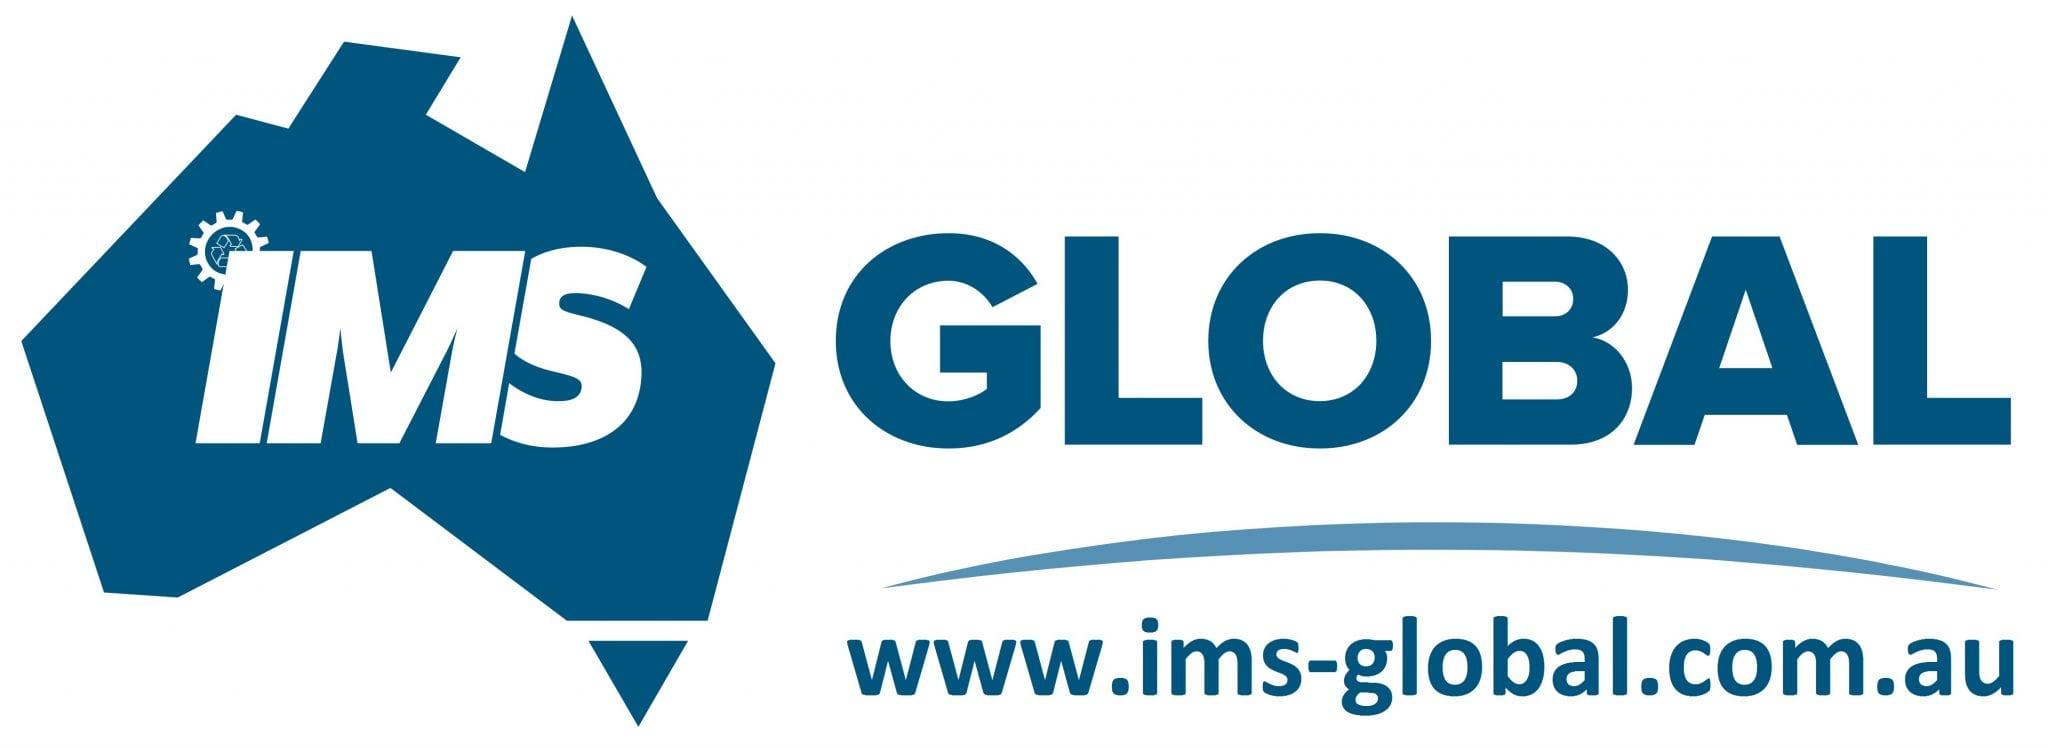 ims-global-logo